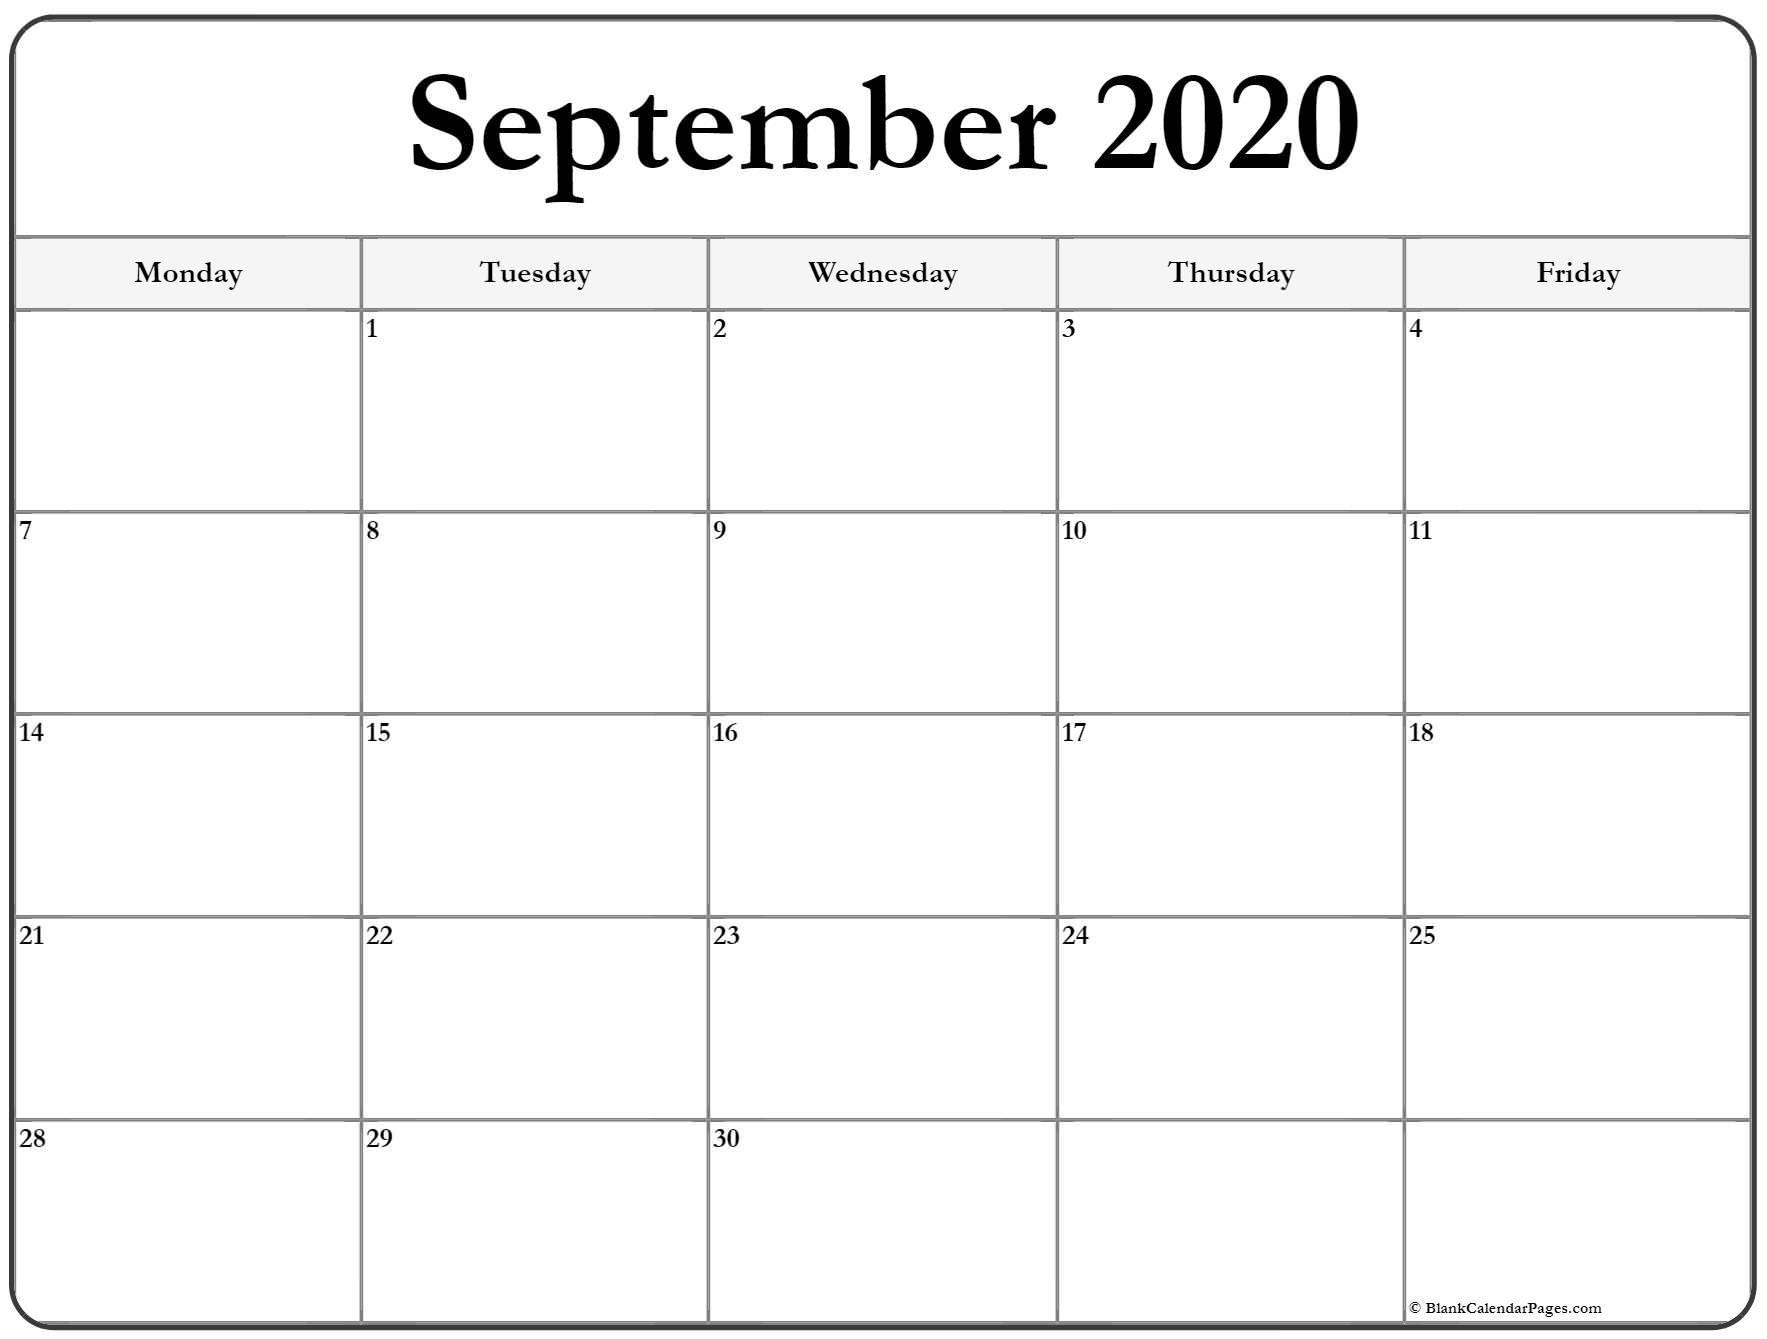 September 2020 Monday Calendar | Monday To Sunday intended for Monday Through Saturday Calendar